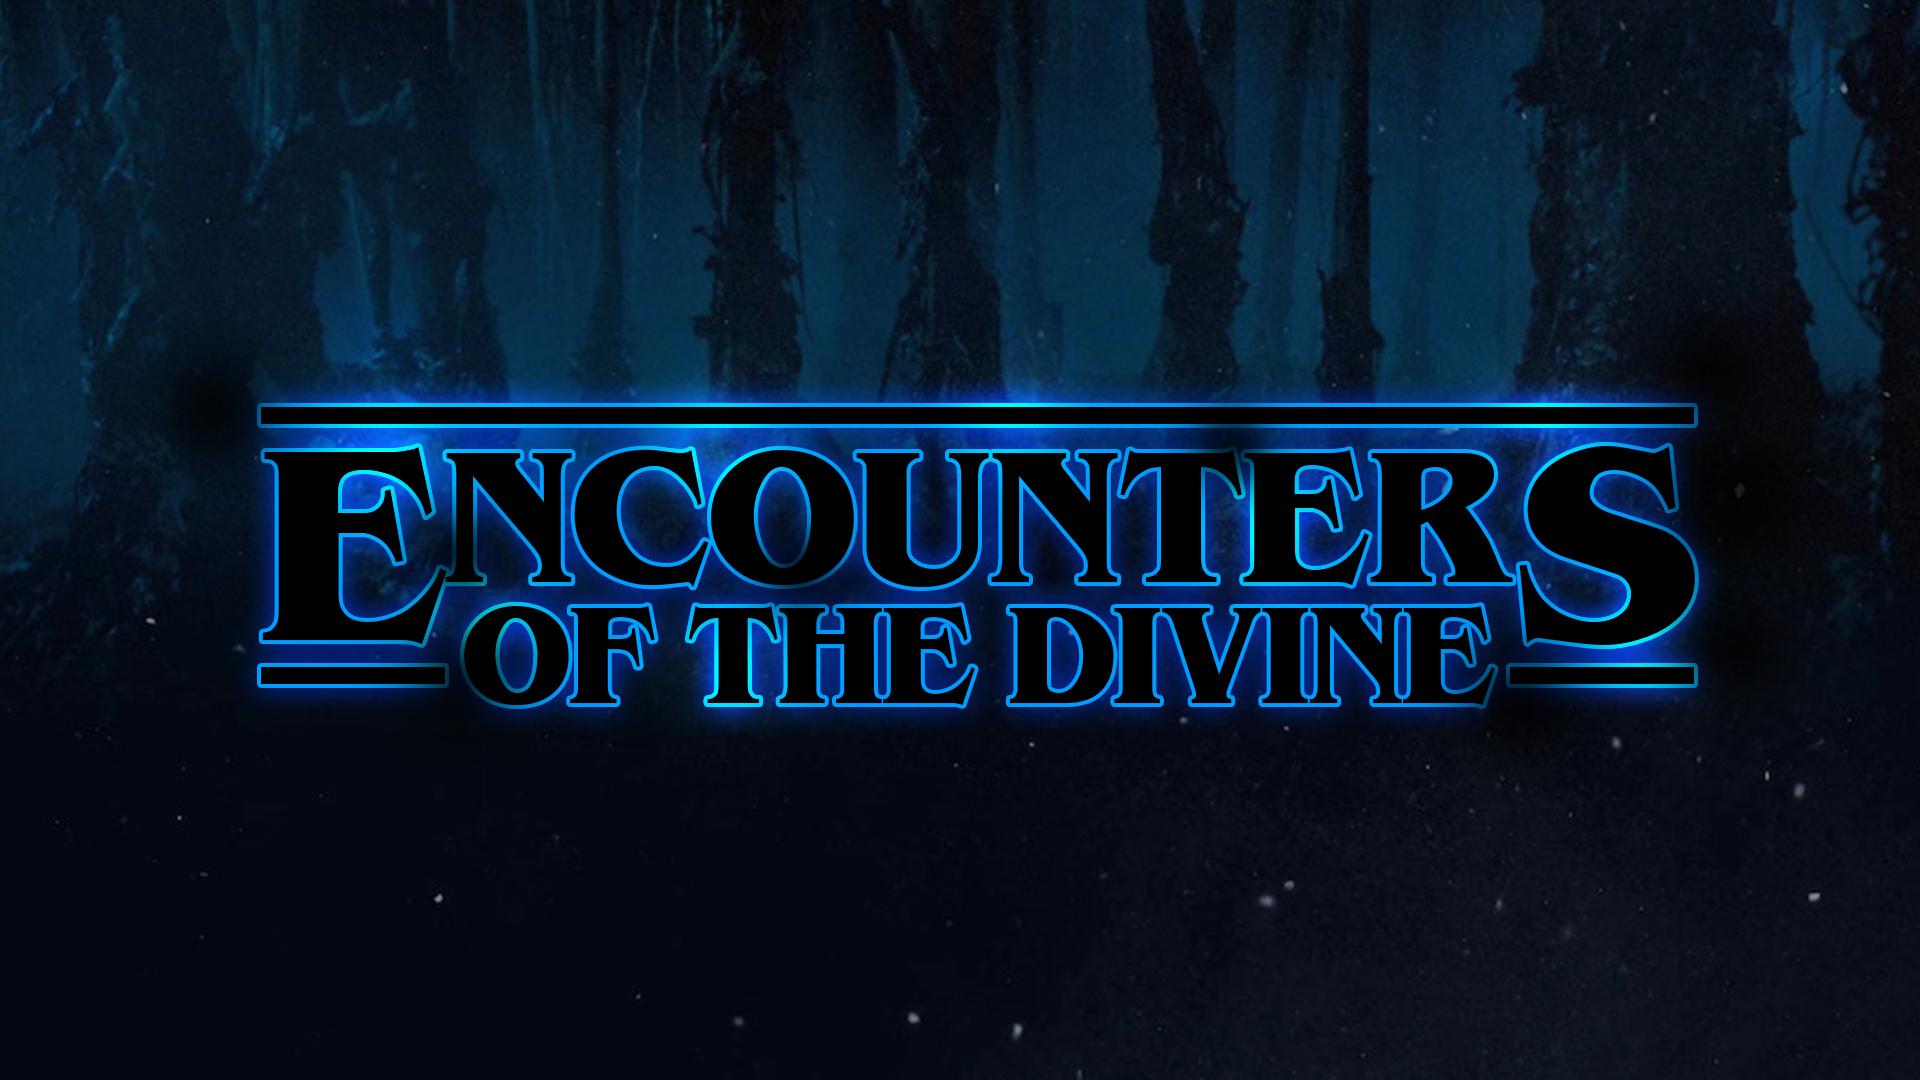 Encounters_Final.jpg